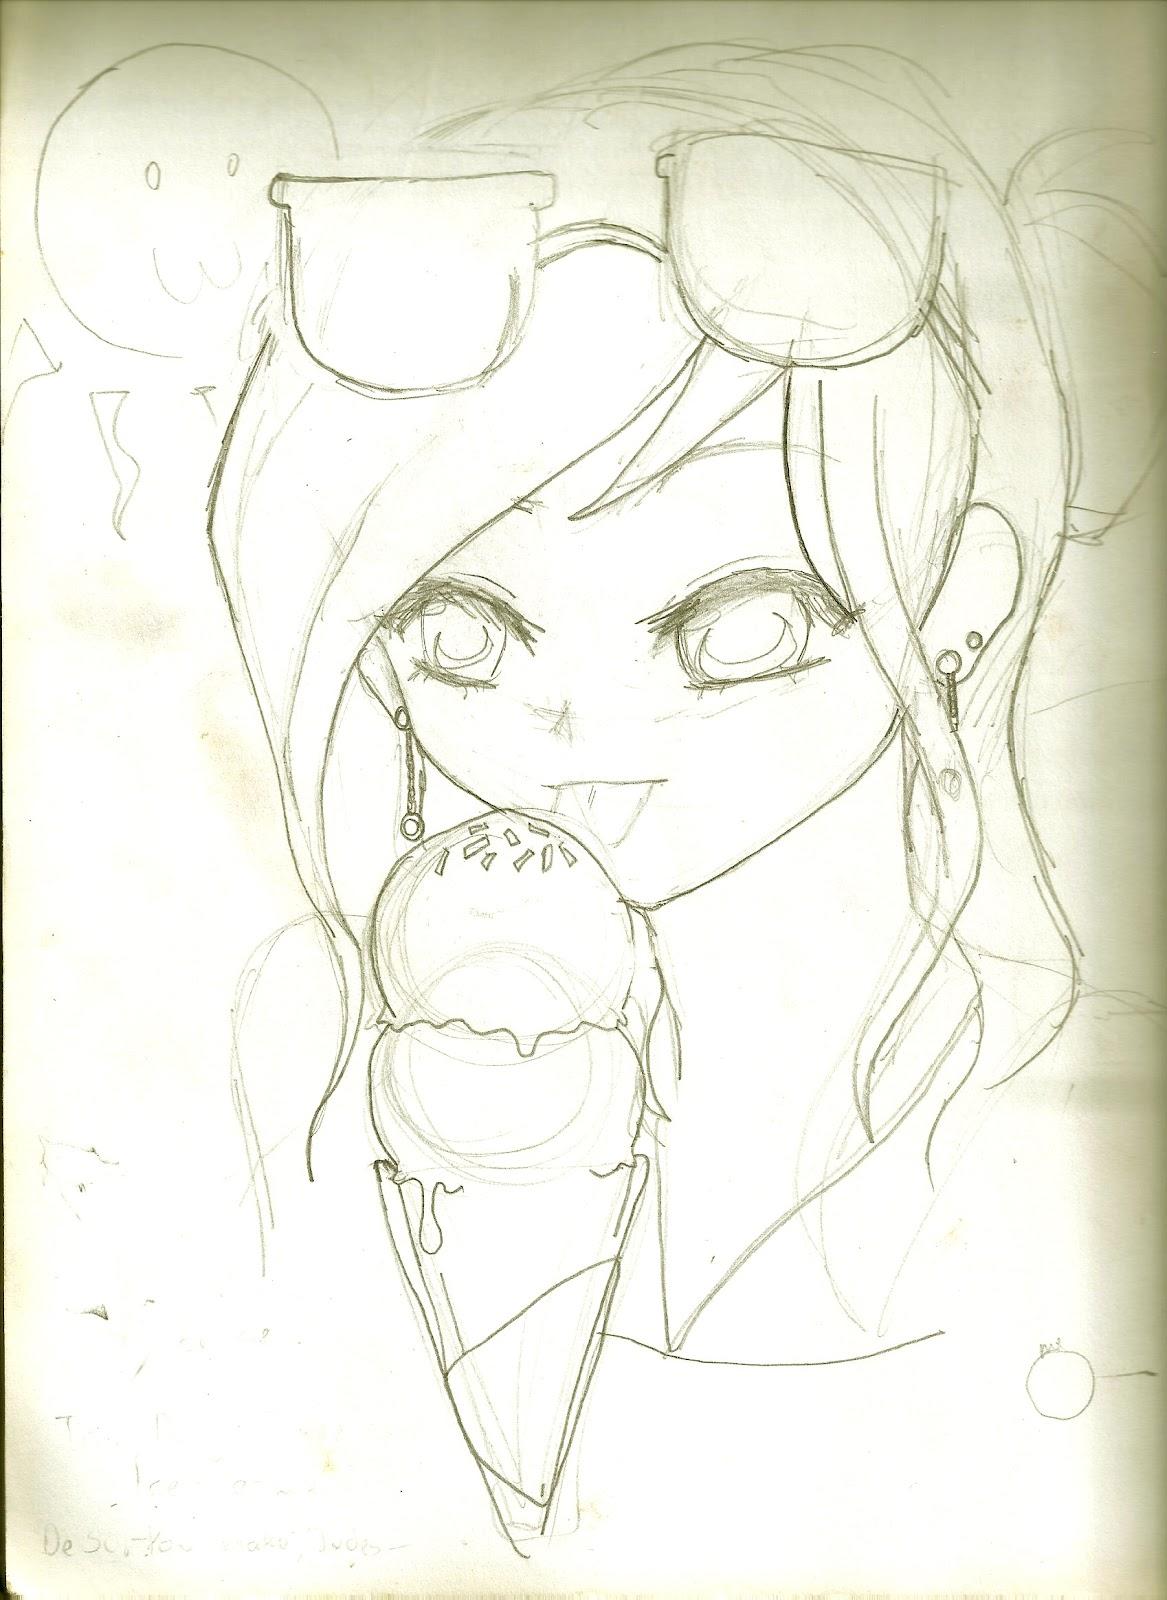 Everyday Im Licking Icecream